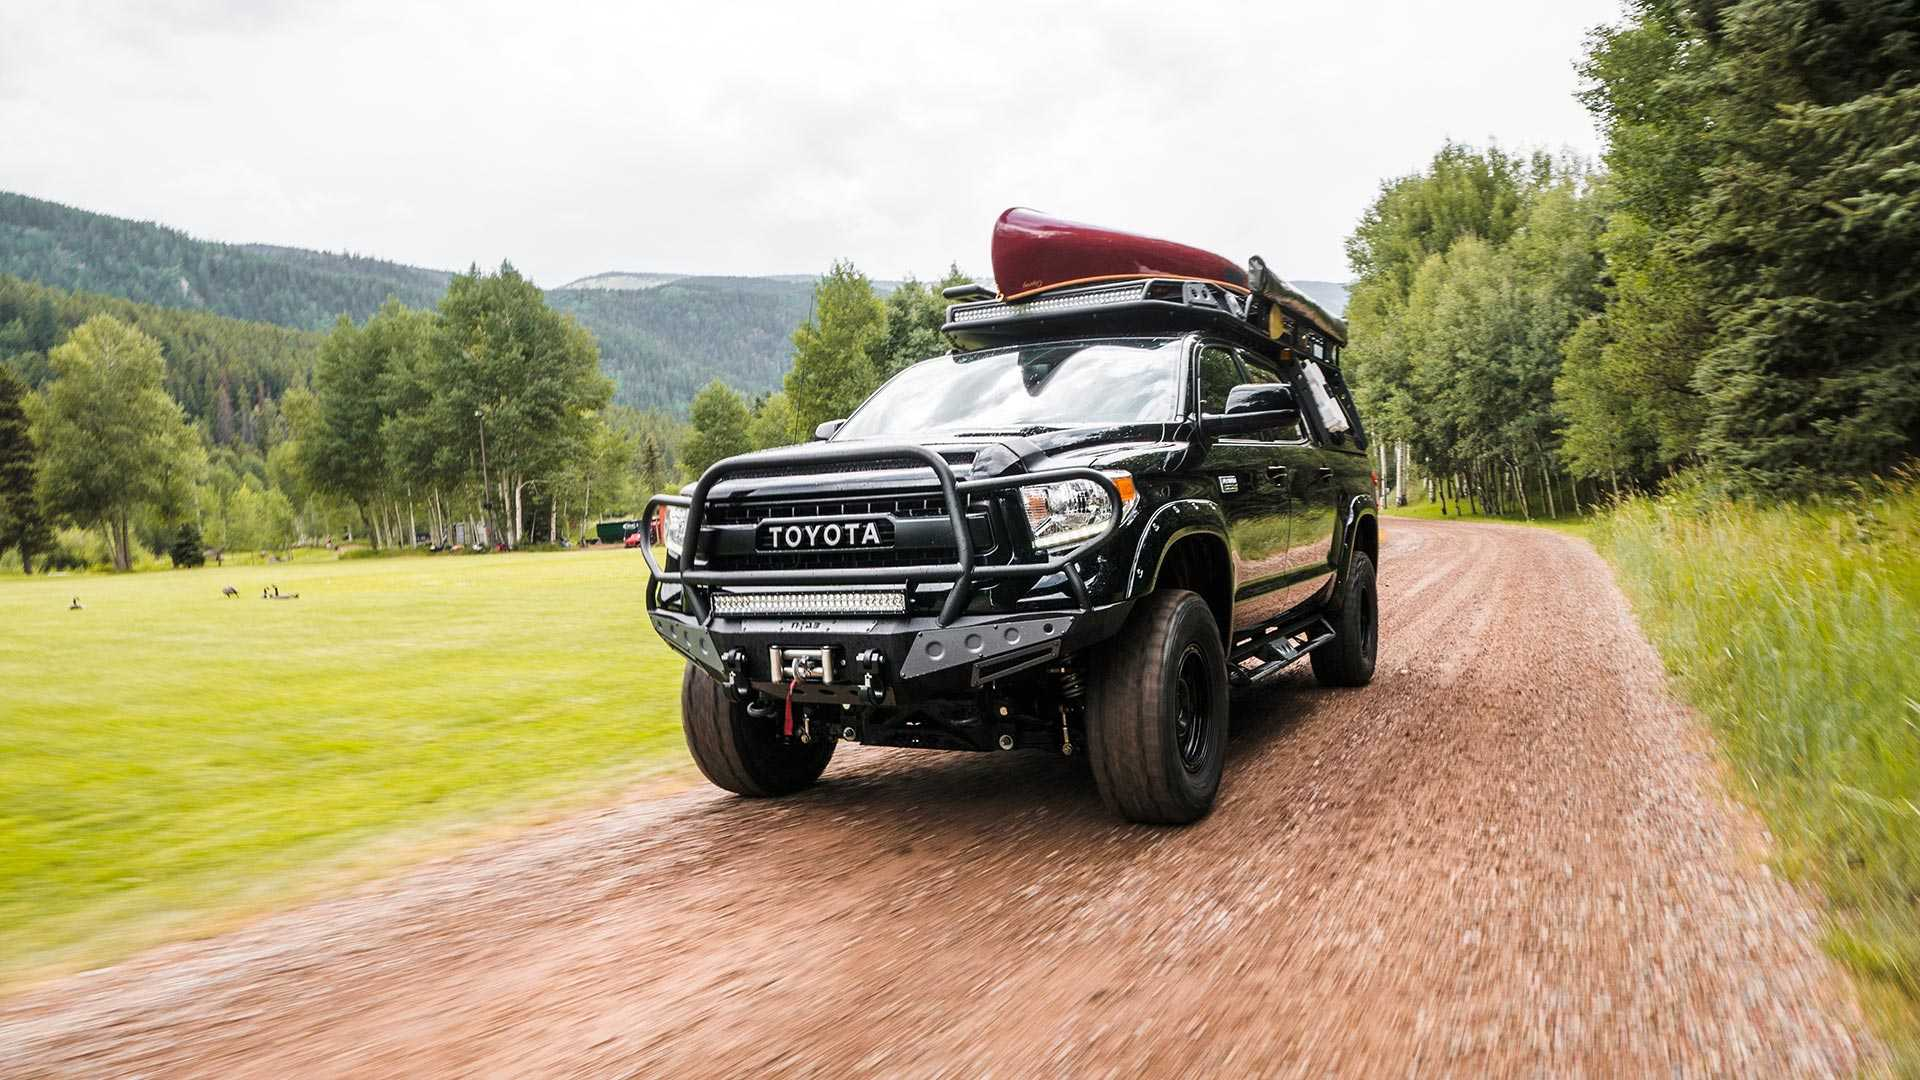 toyota-tundra-kevin-costner-custom (5)